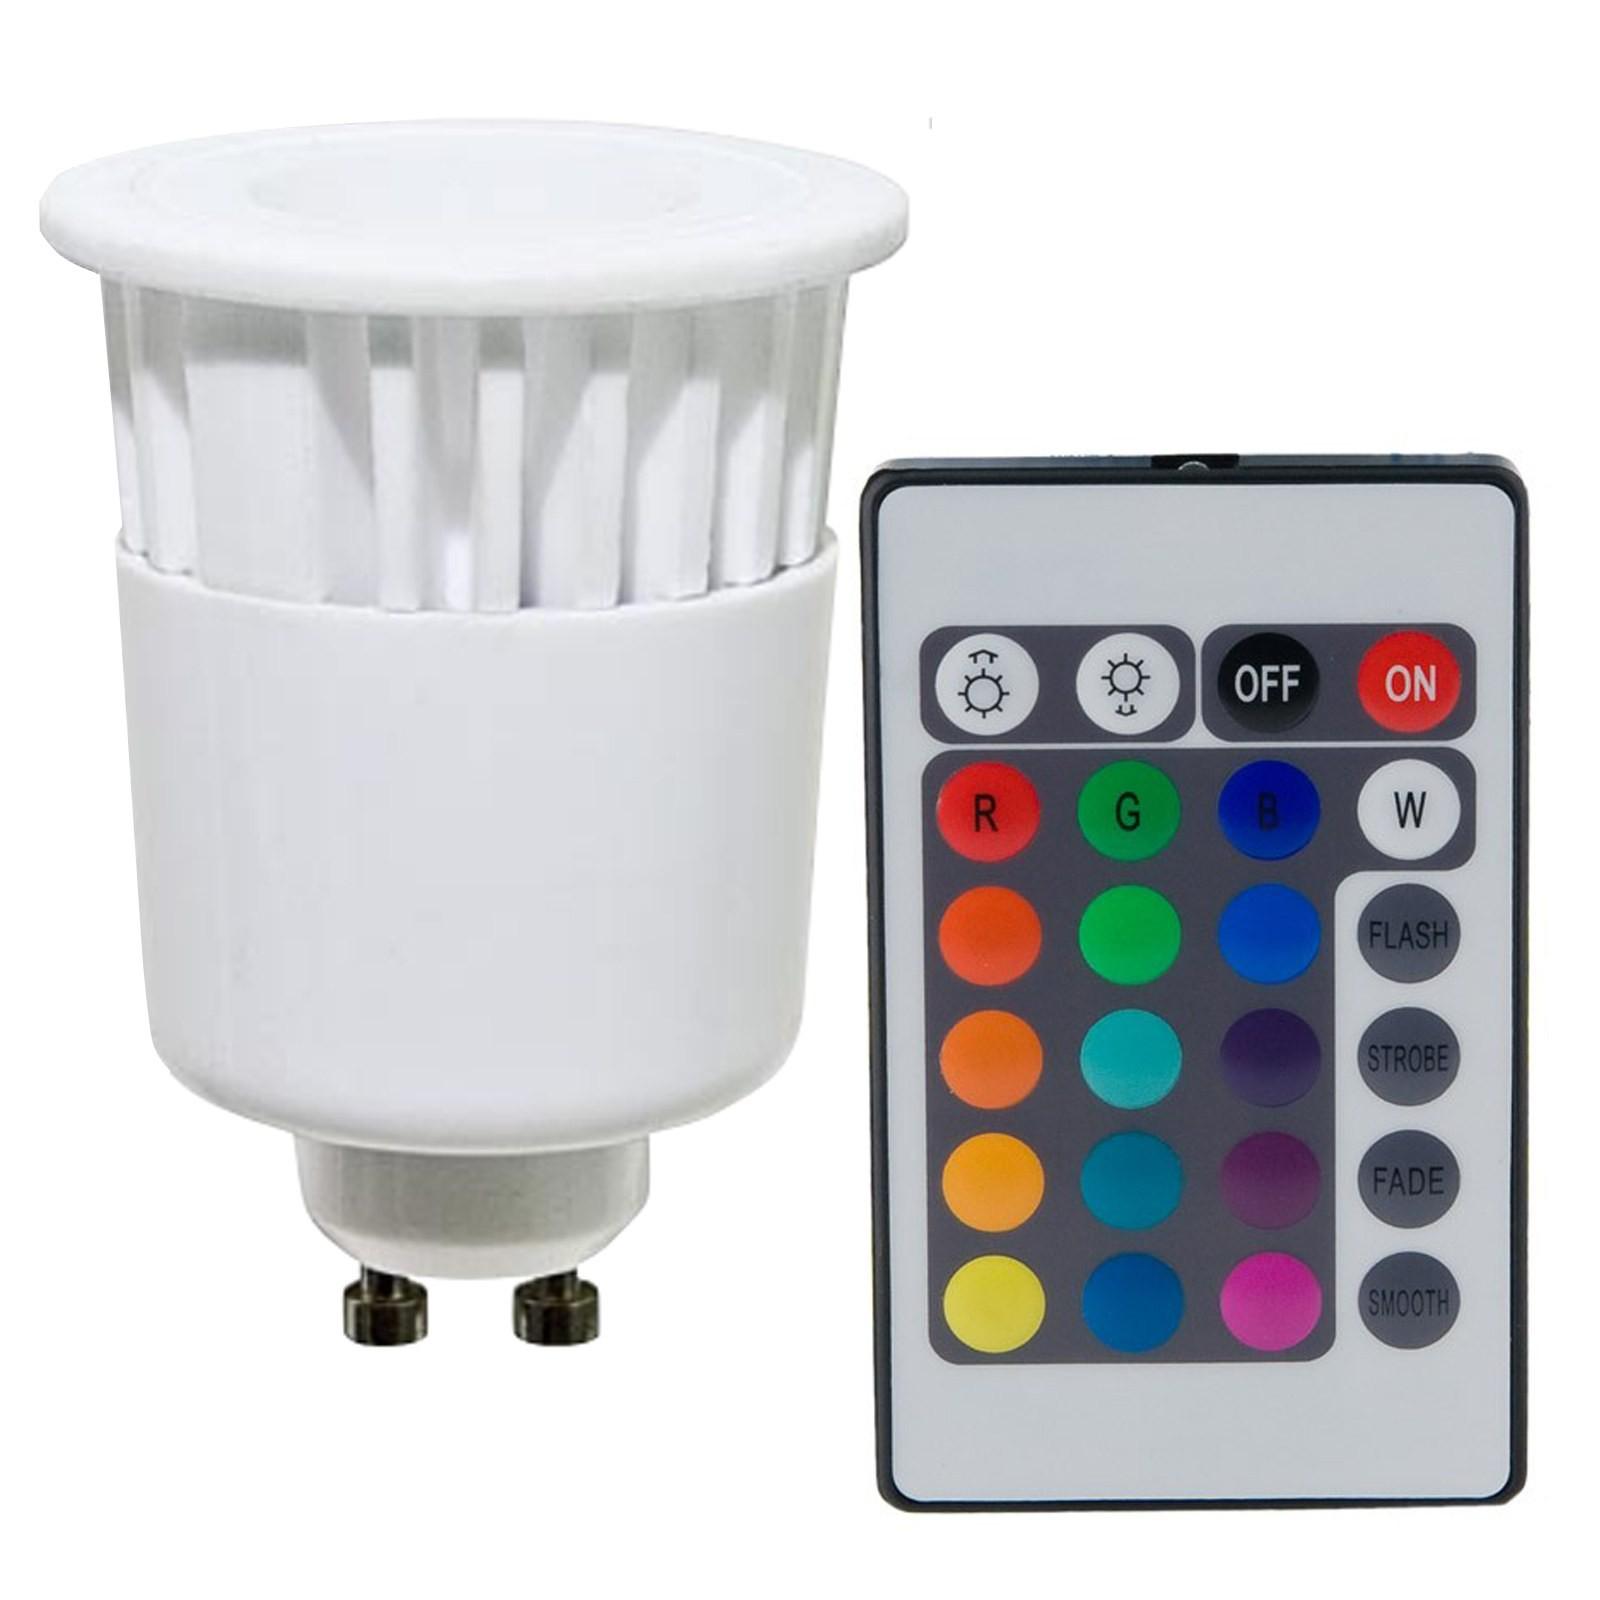 Home / Lampada Lampadina LED RGB GU10 Telecomando Faretto Colori 4W ...